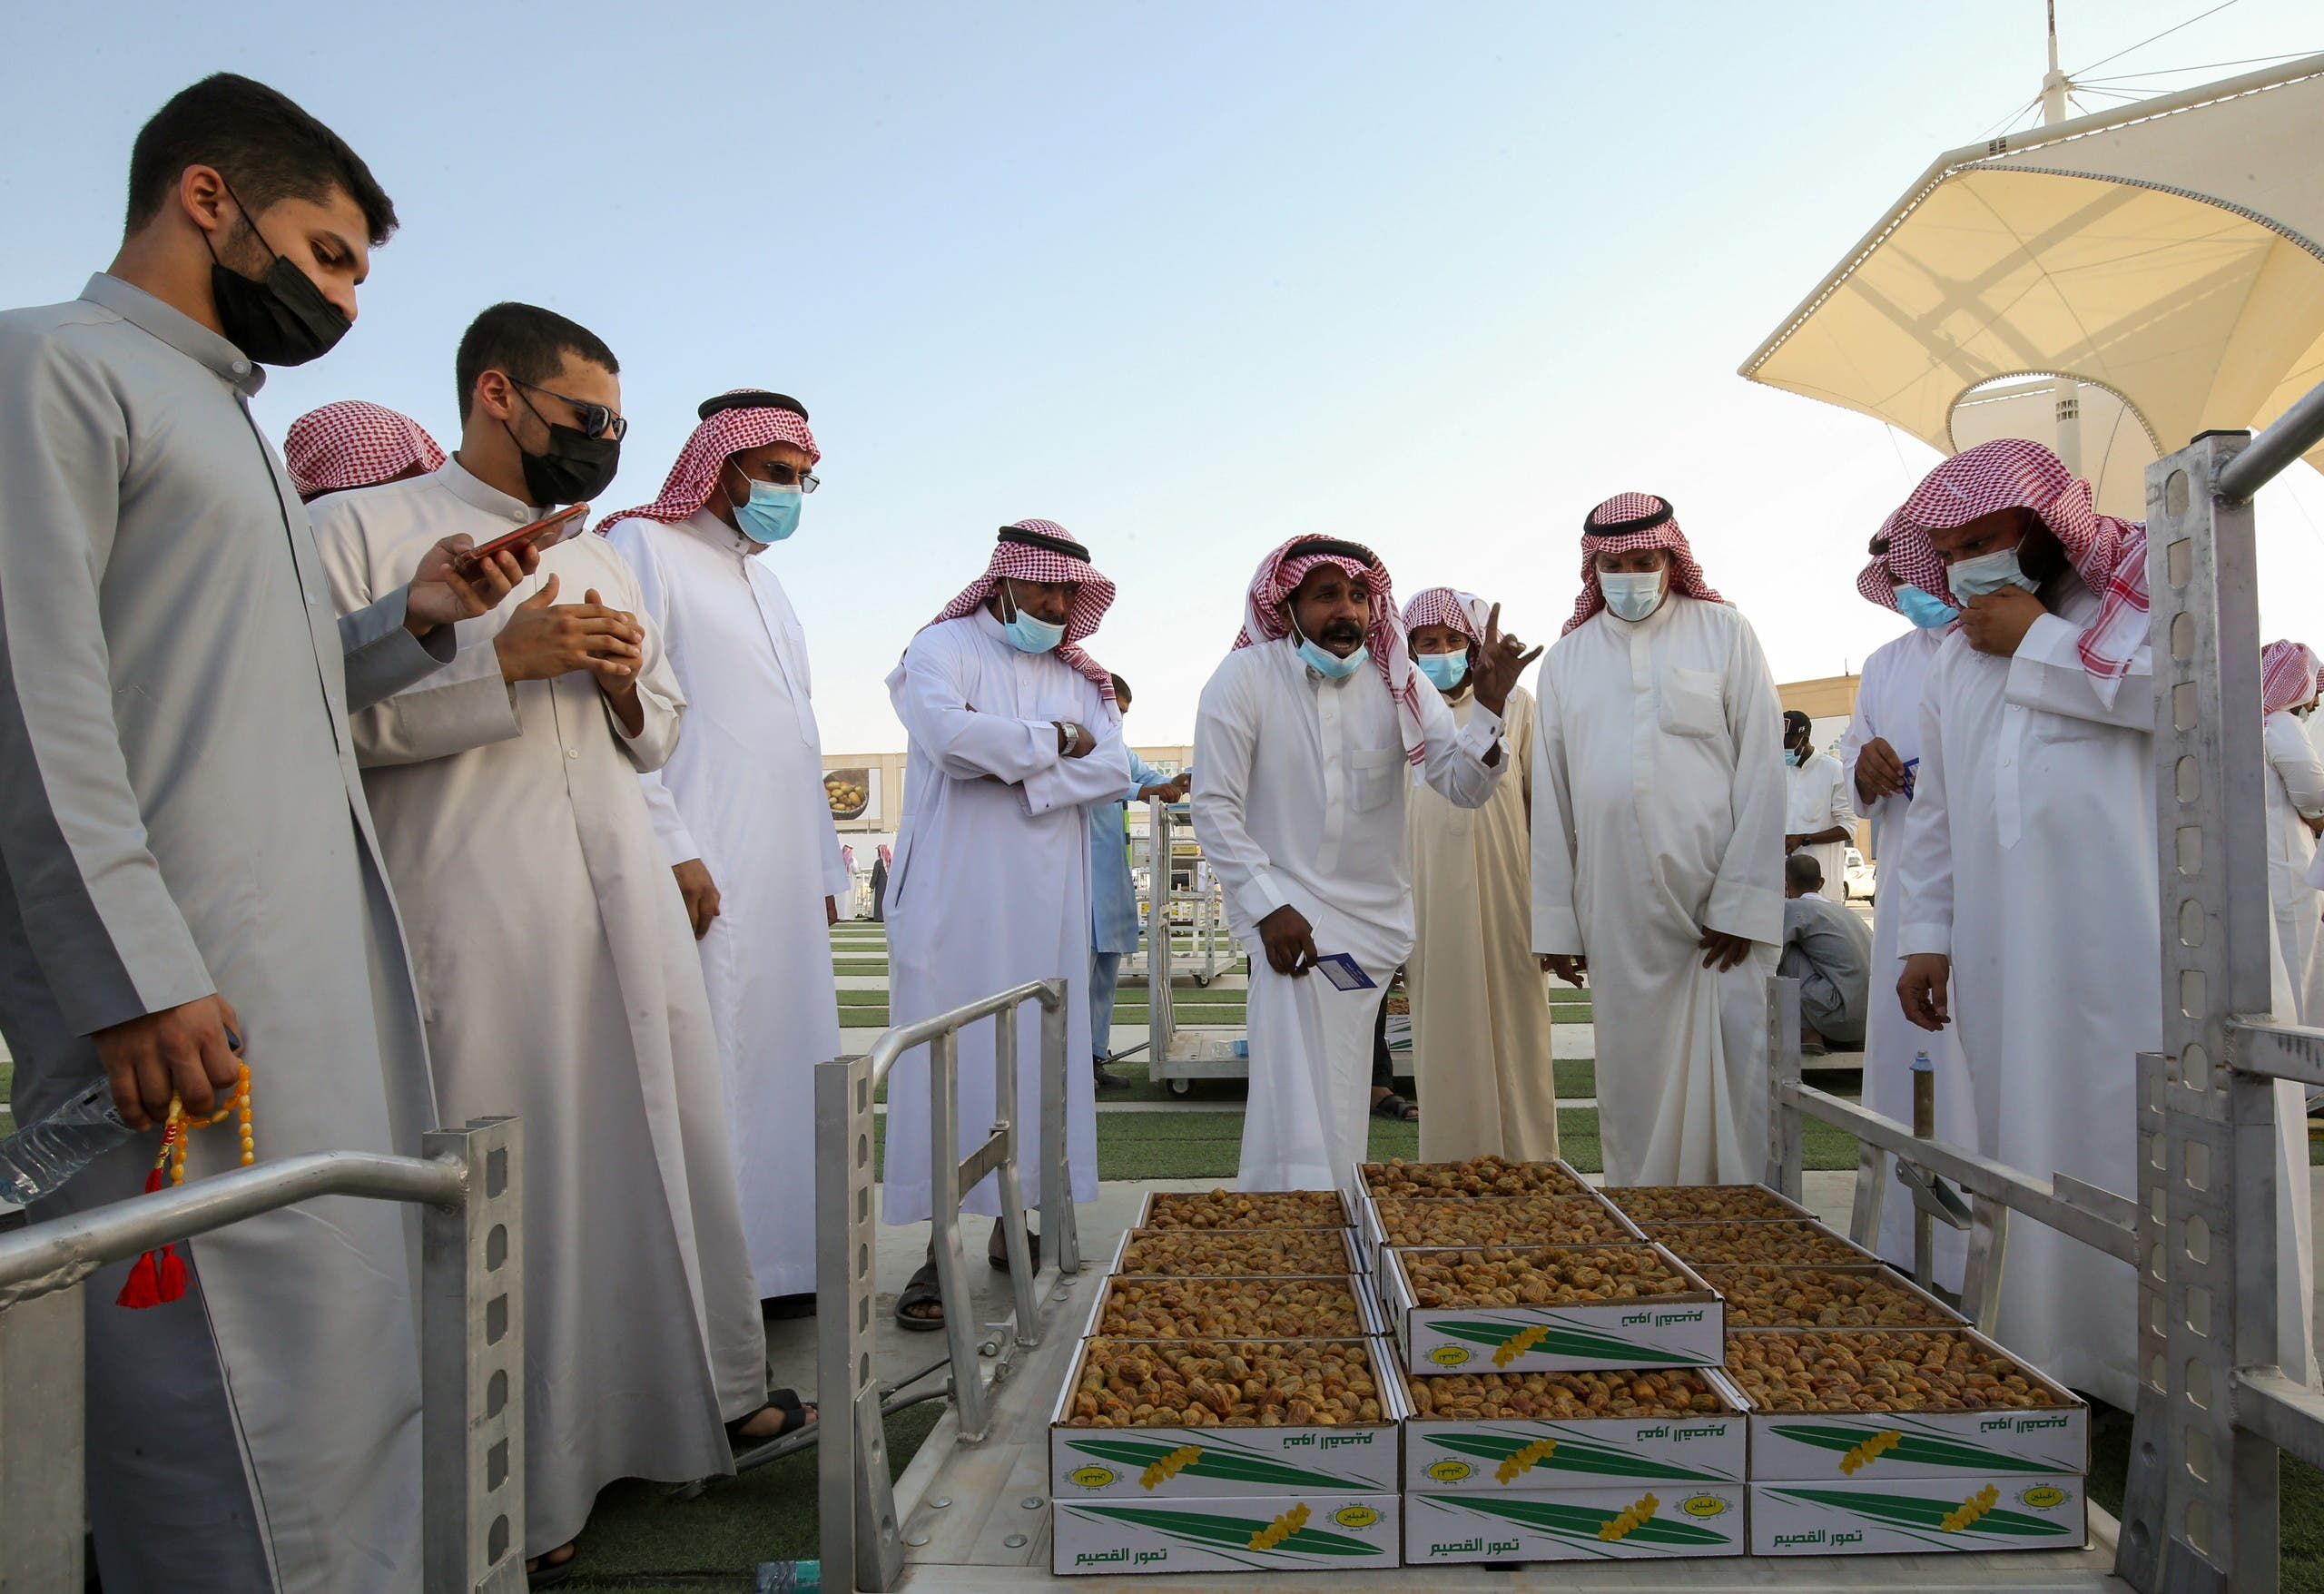 Saudi farmer displays dates to customers during Unaizah Season for Dates, at Unaizah city in Al-Qassim province, Saudi Arabia August 10, 2021. Picture taken August 10, 2021. (Reuters)